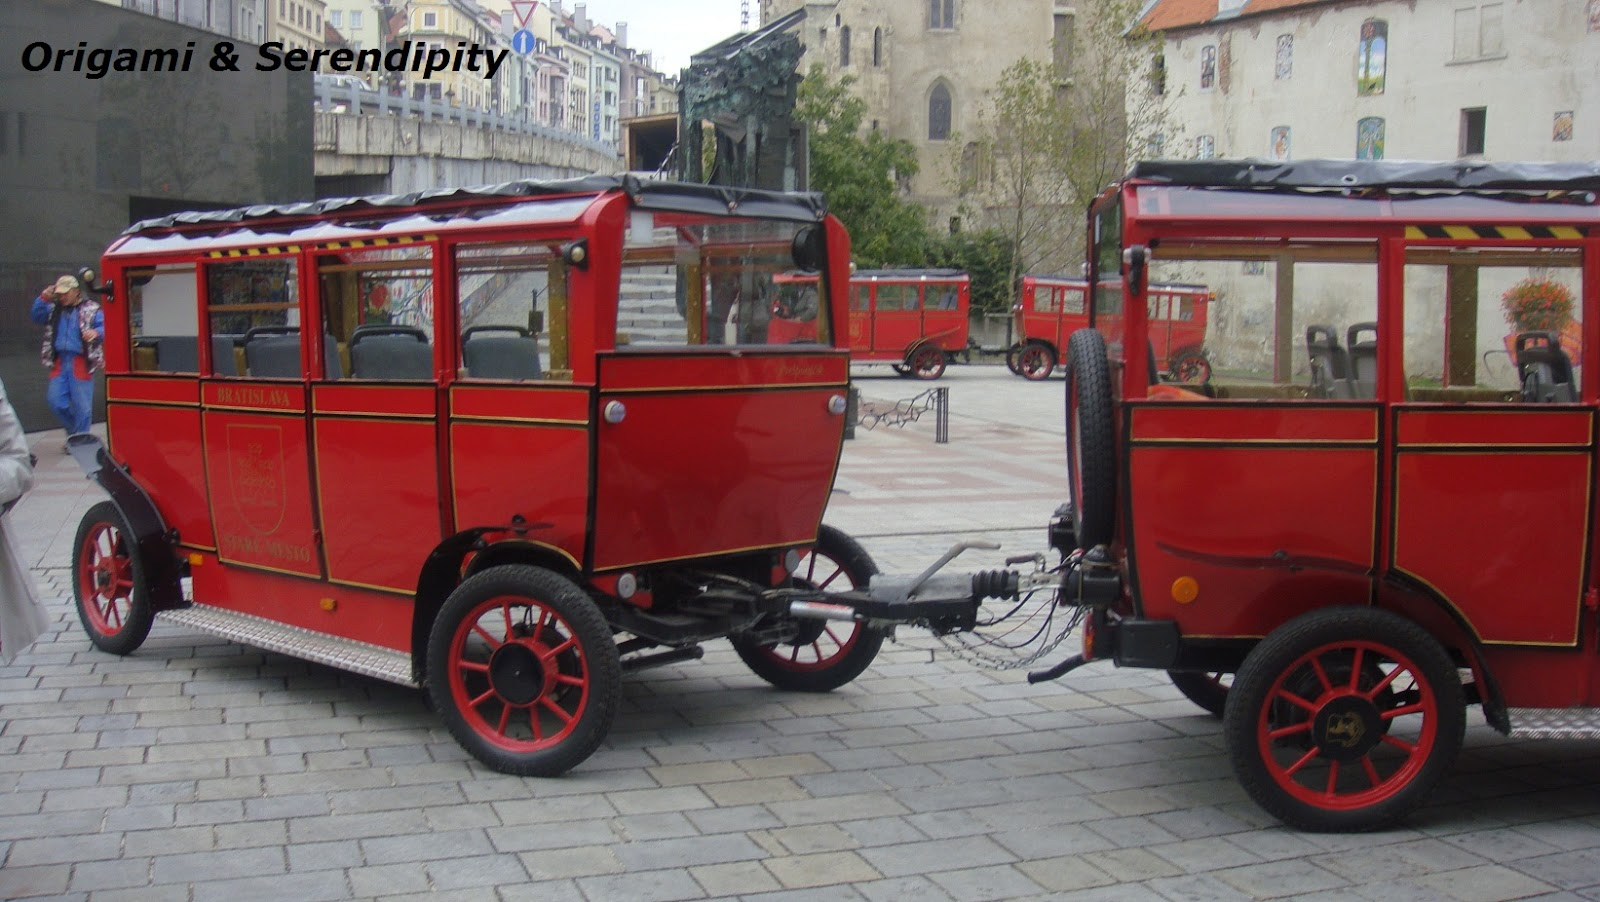 Bratislava, Elisa N, Blog de Viajes, Lifestyle, Travel